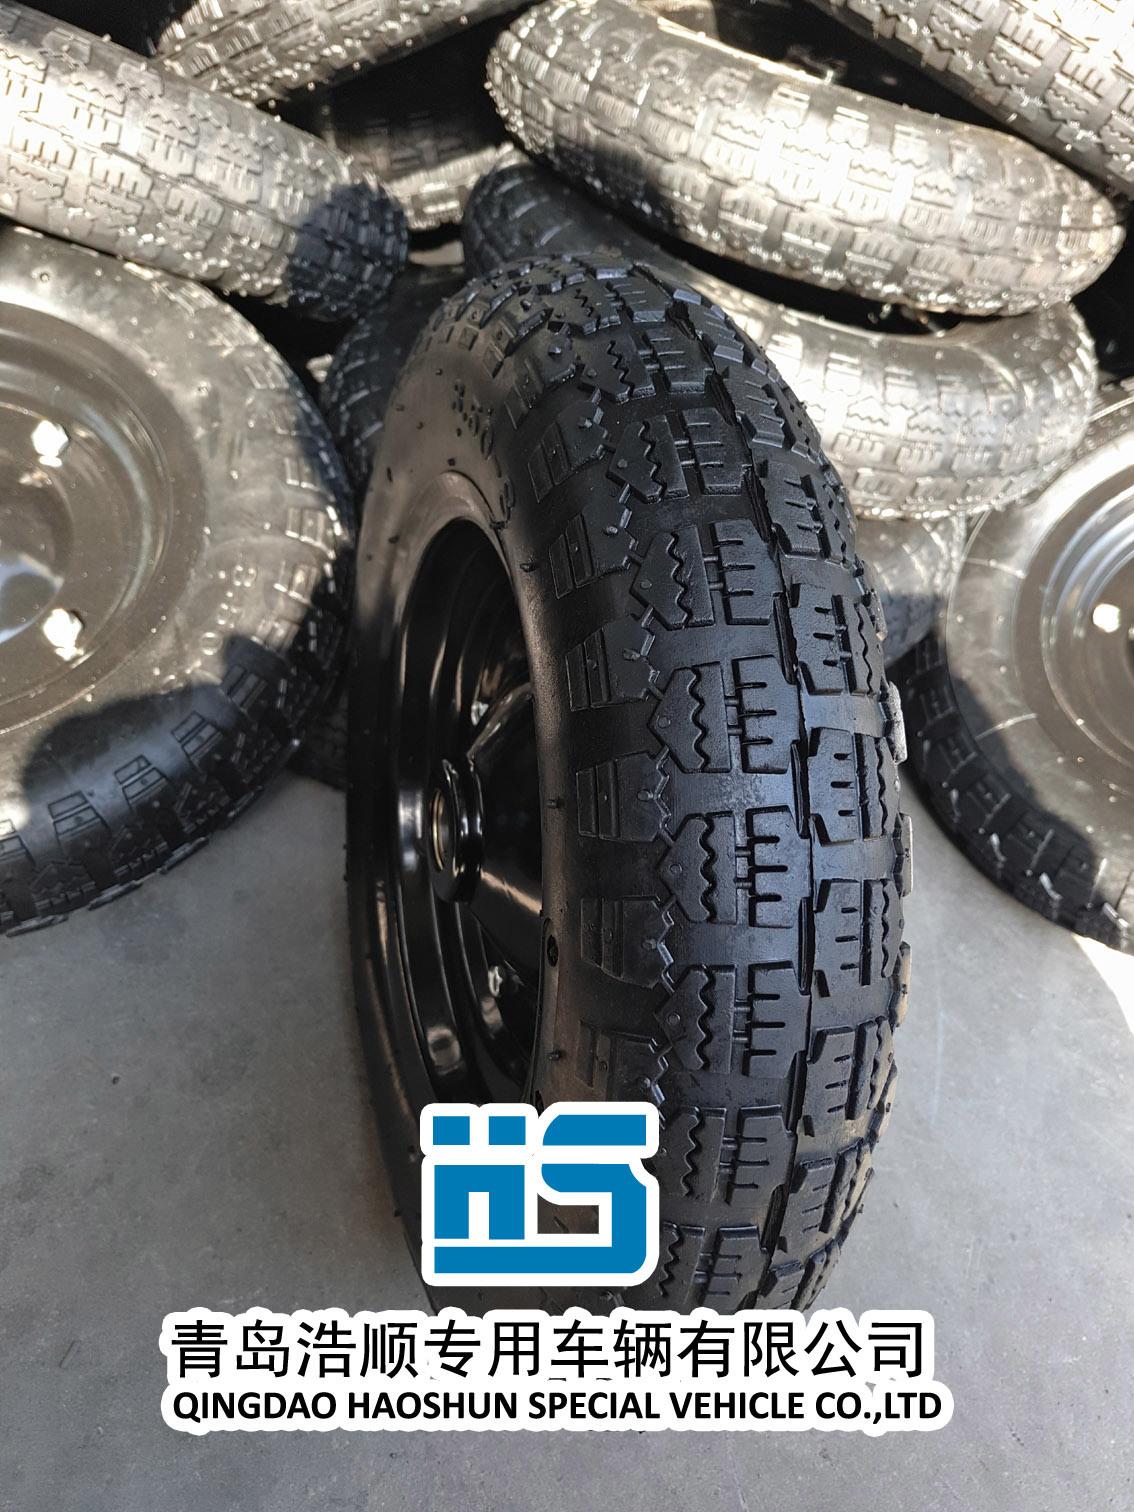 Rubber Wheel Carretilla Neumatico Wheelbarrow Wheel Wheelbarrow Tyre Tube 3.50-7 3.50-8